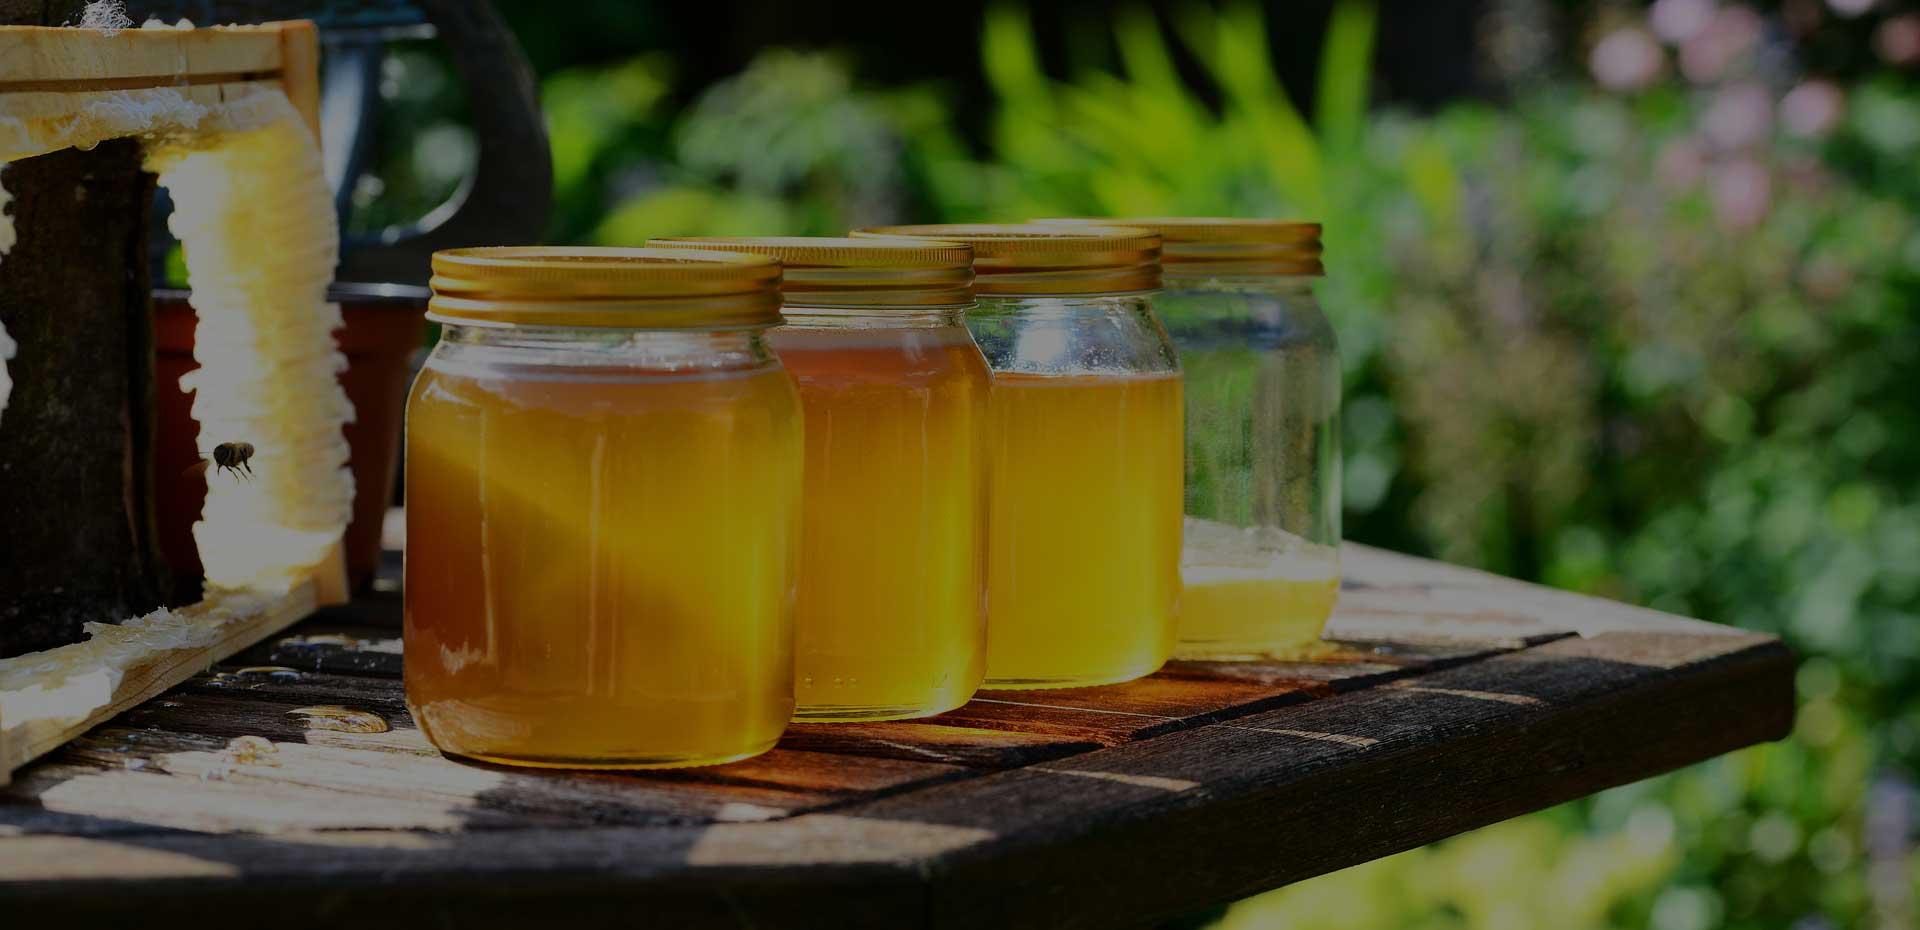 Des pots de miel et un cadre